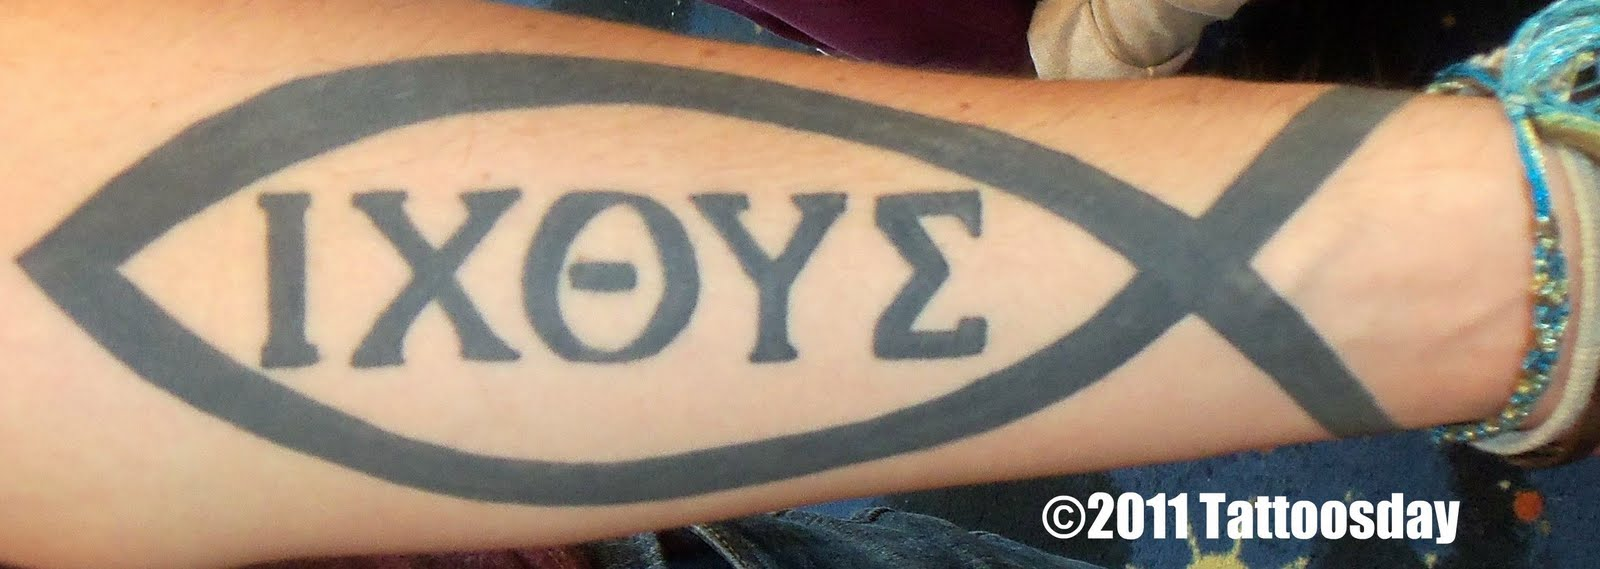 tattoosday a tattoo blog musician monday a trio of tattoos from rh tattoosday blogspot com ixoye tattoo needles ixoye tattoo needles